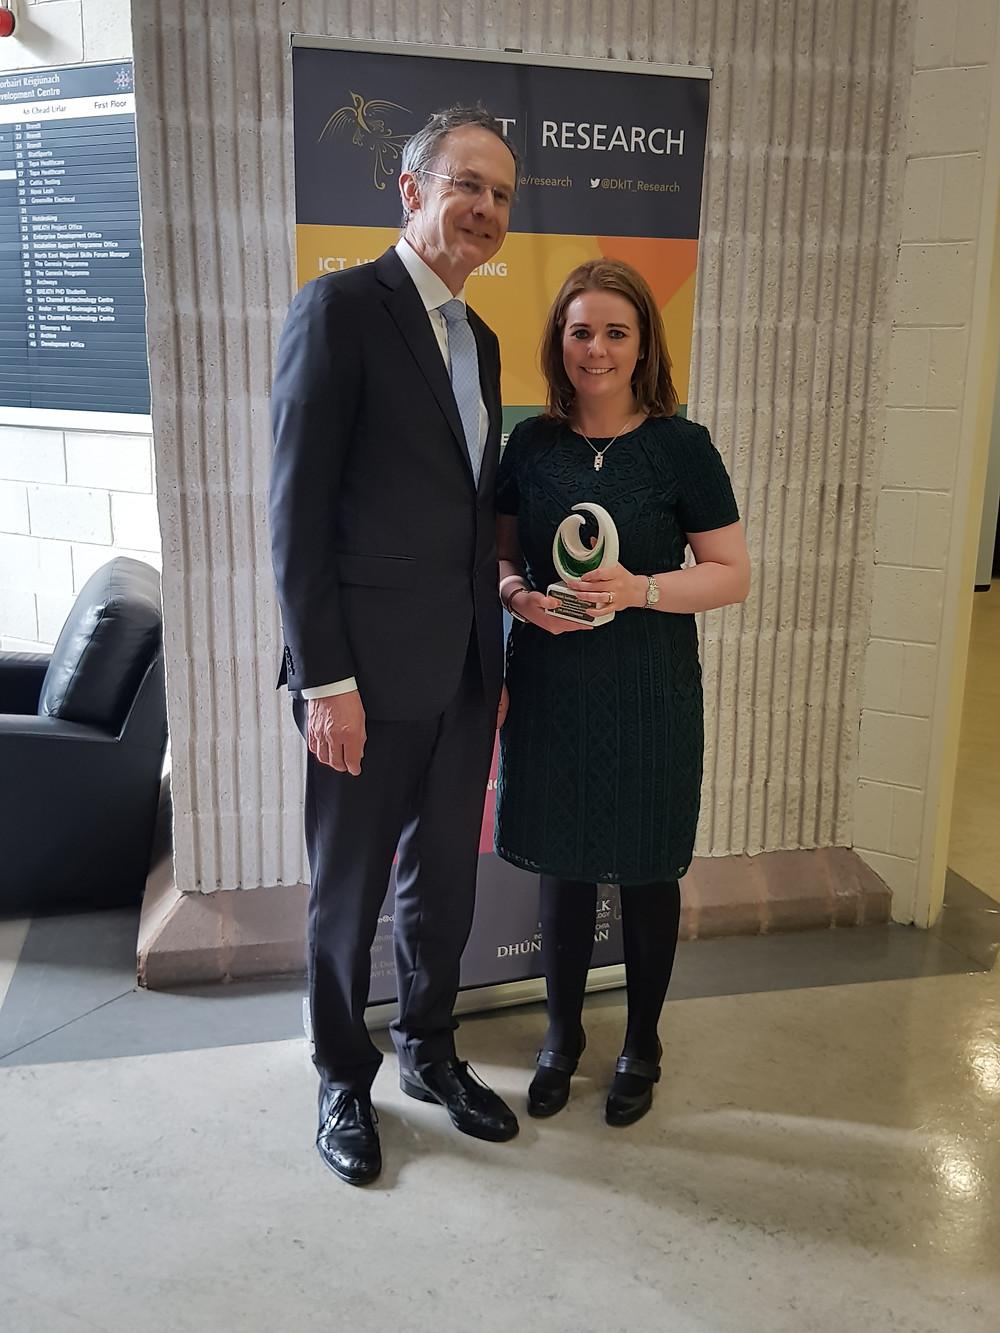 Adèle with DkIT President Dr Michael Mulvey